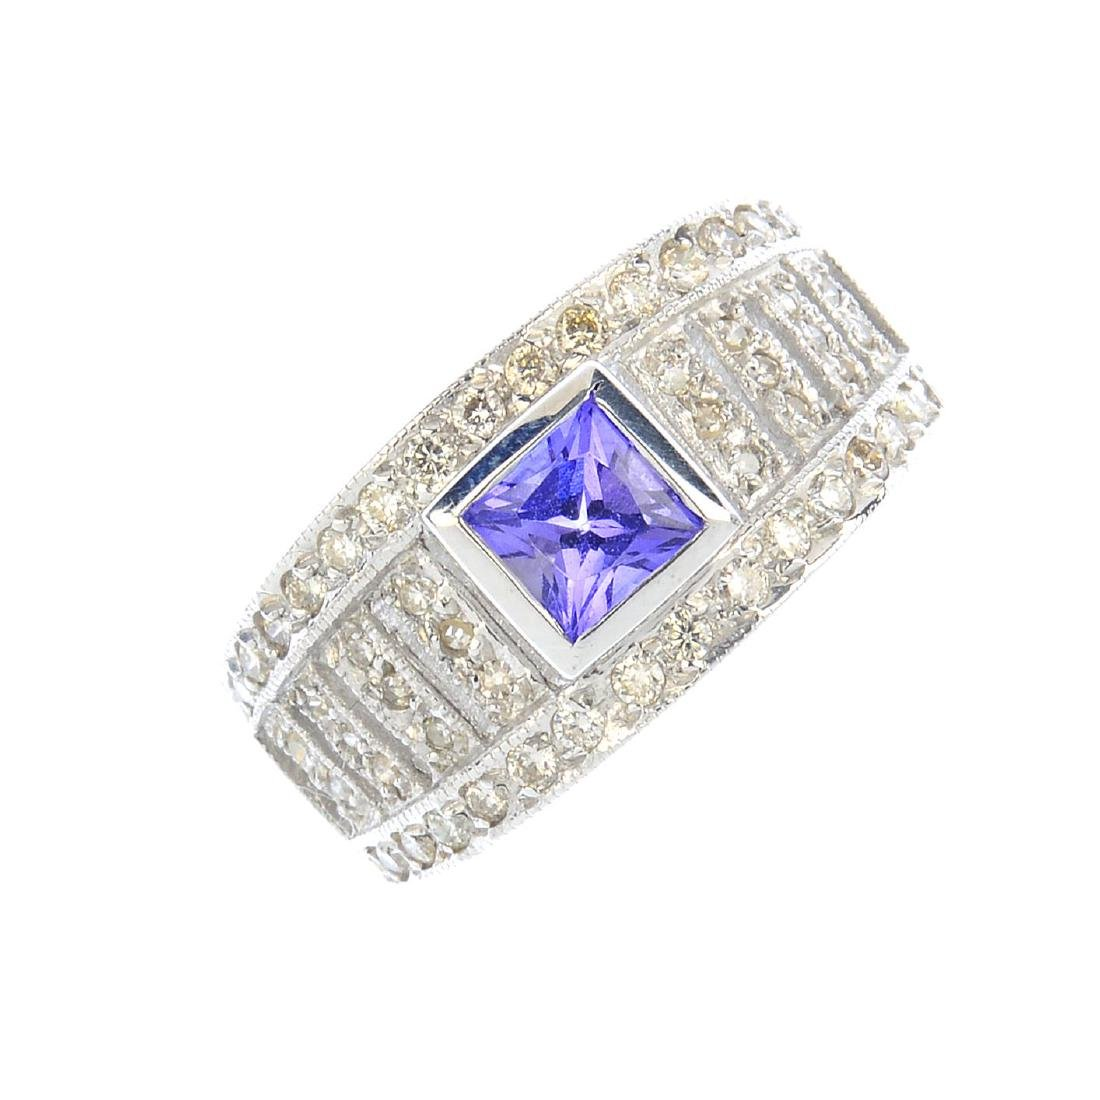 A tanzanite and diamond ring. The square-shape